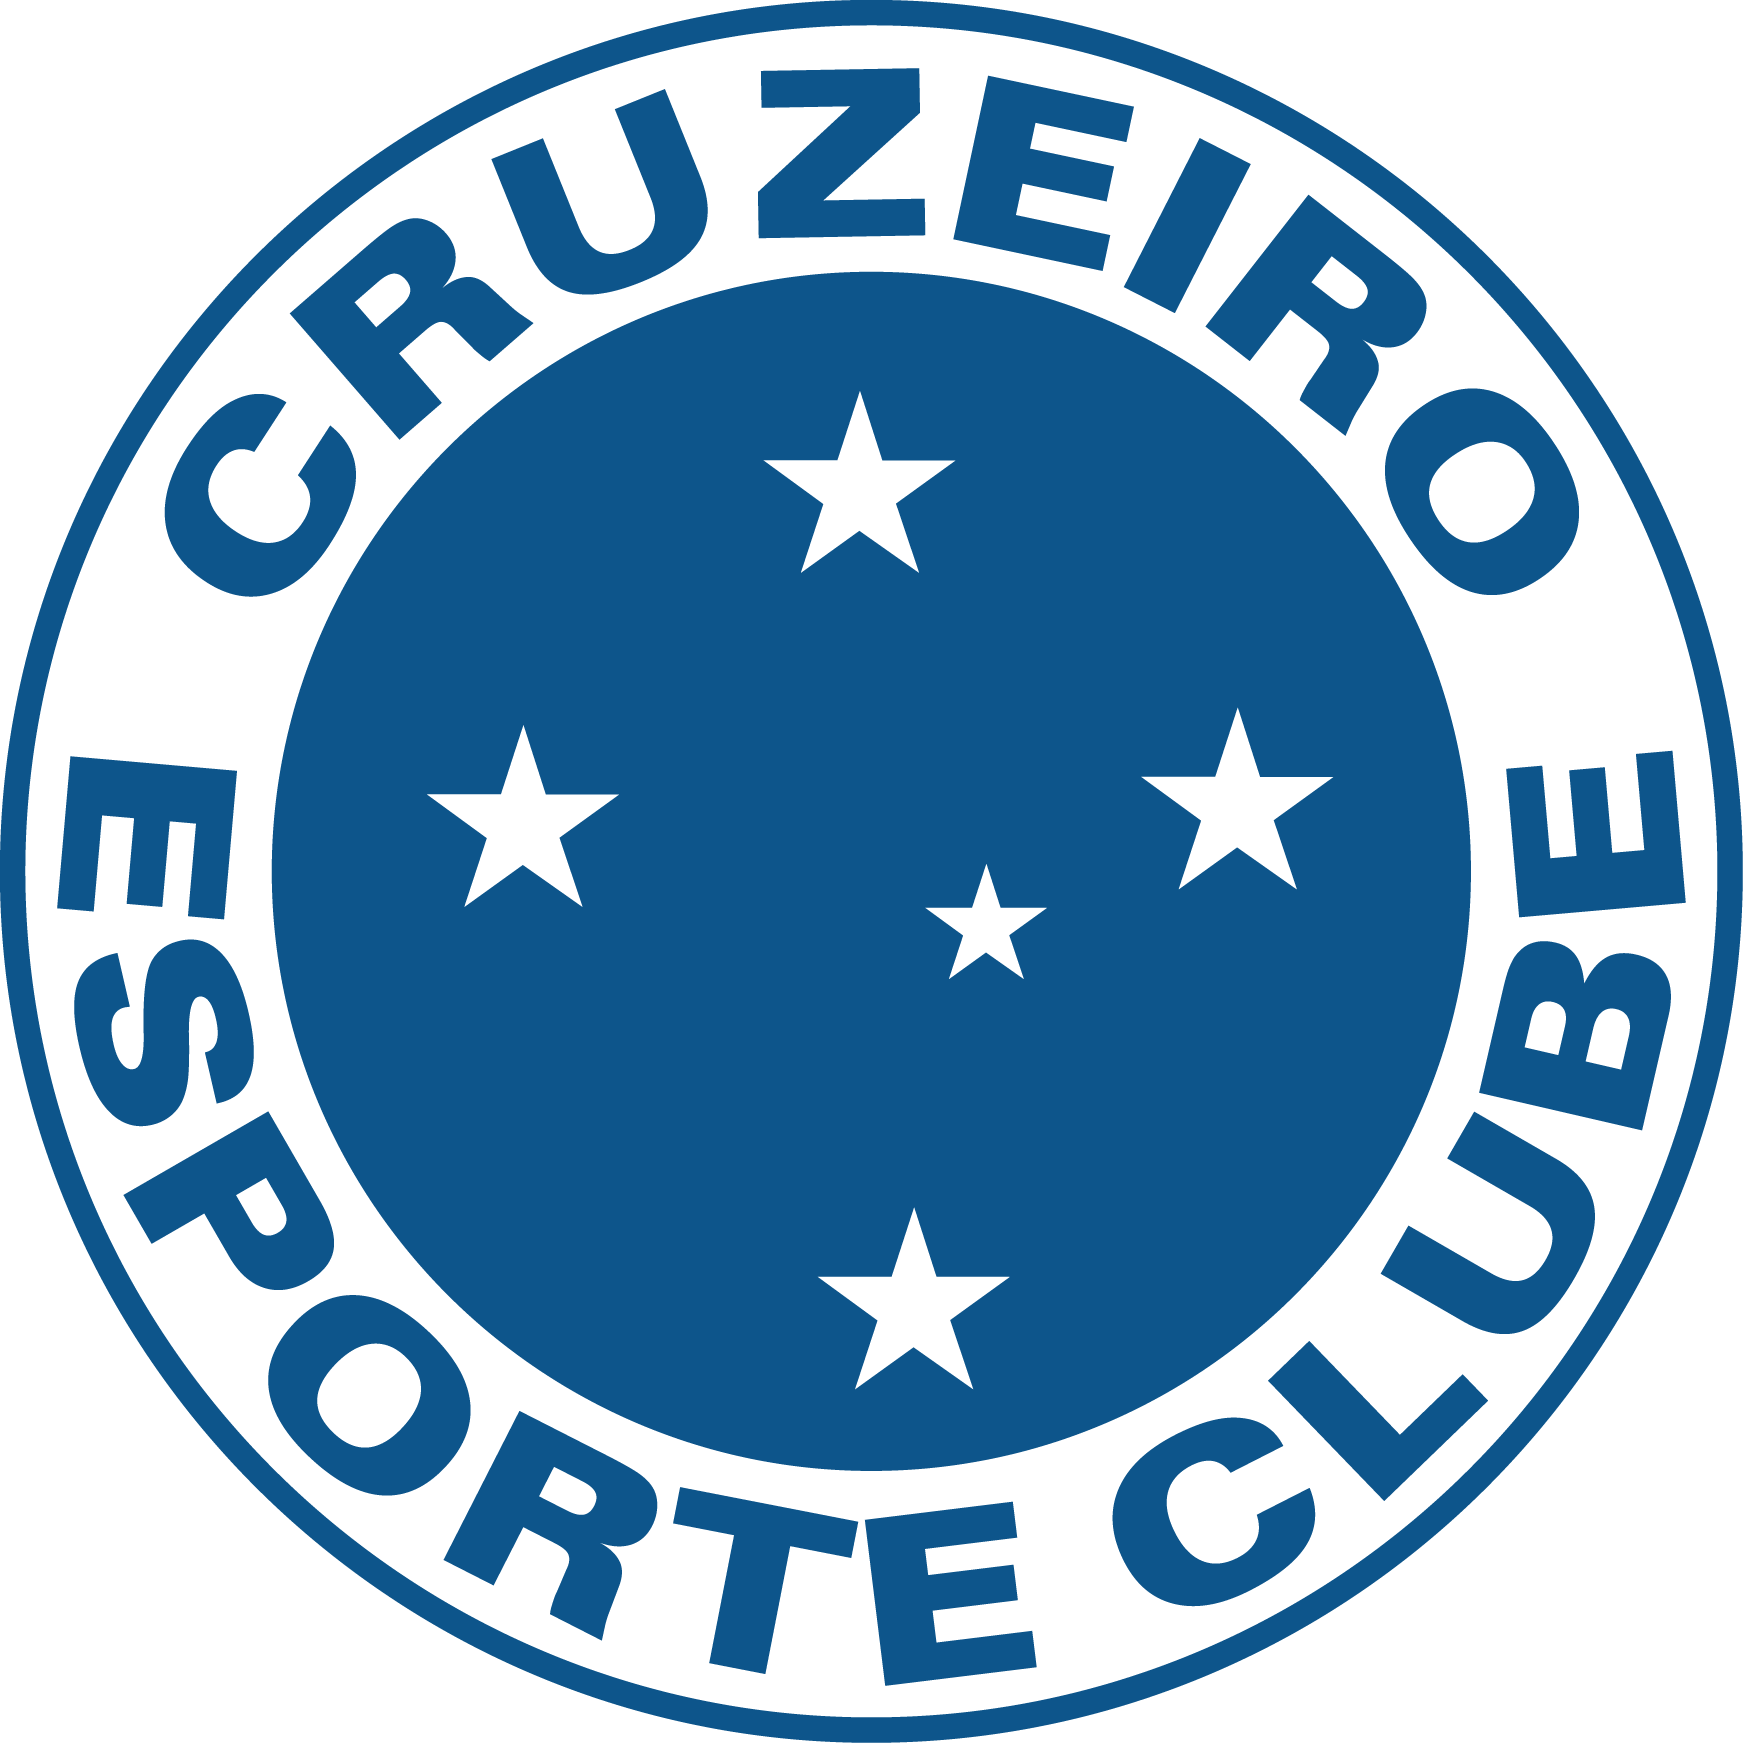 8b2c6d5360f Cruzeiro Esporte Clube